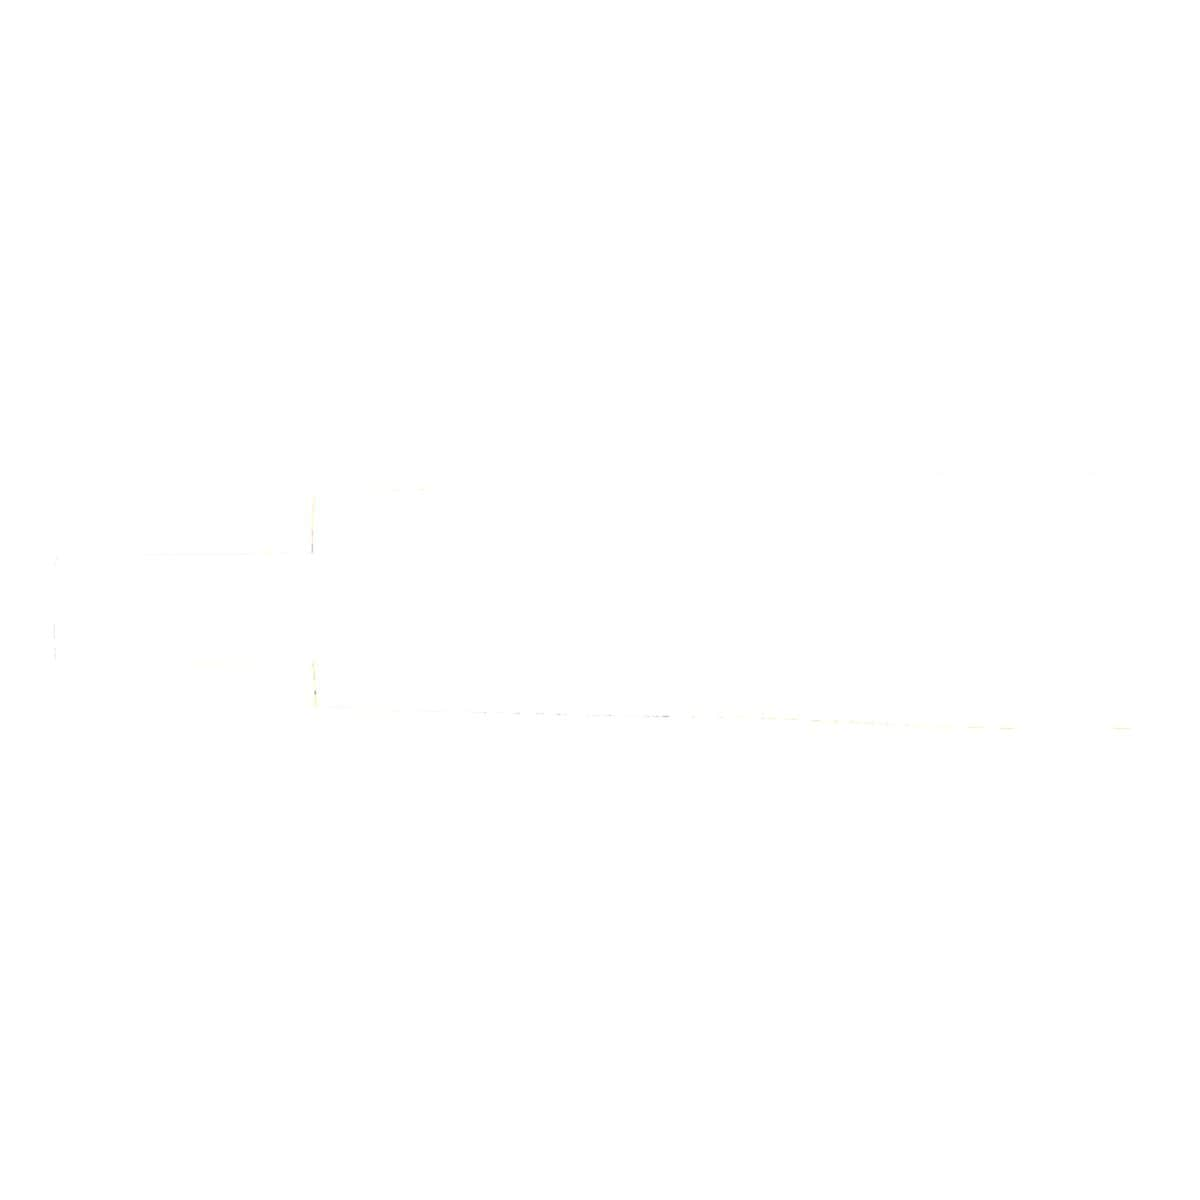 STABILO Textmarker-Nachfülltinte BOSS® refill